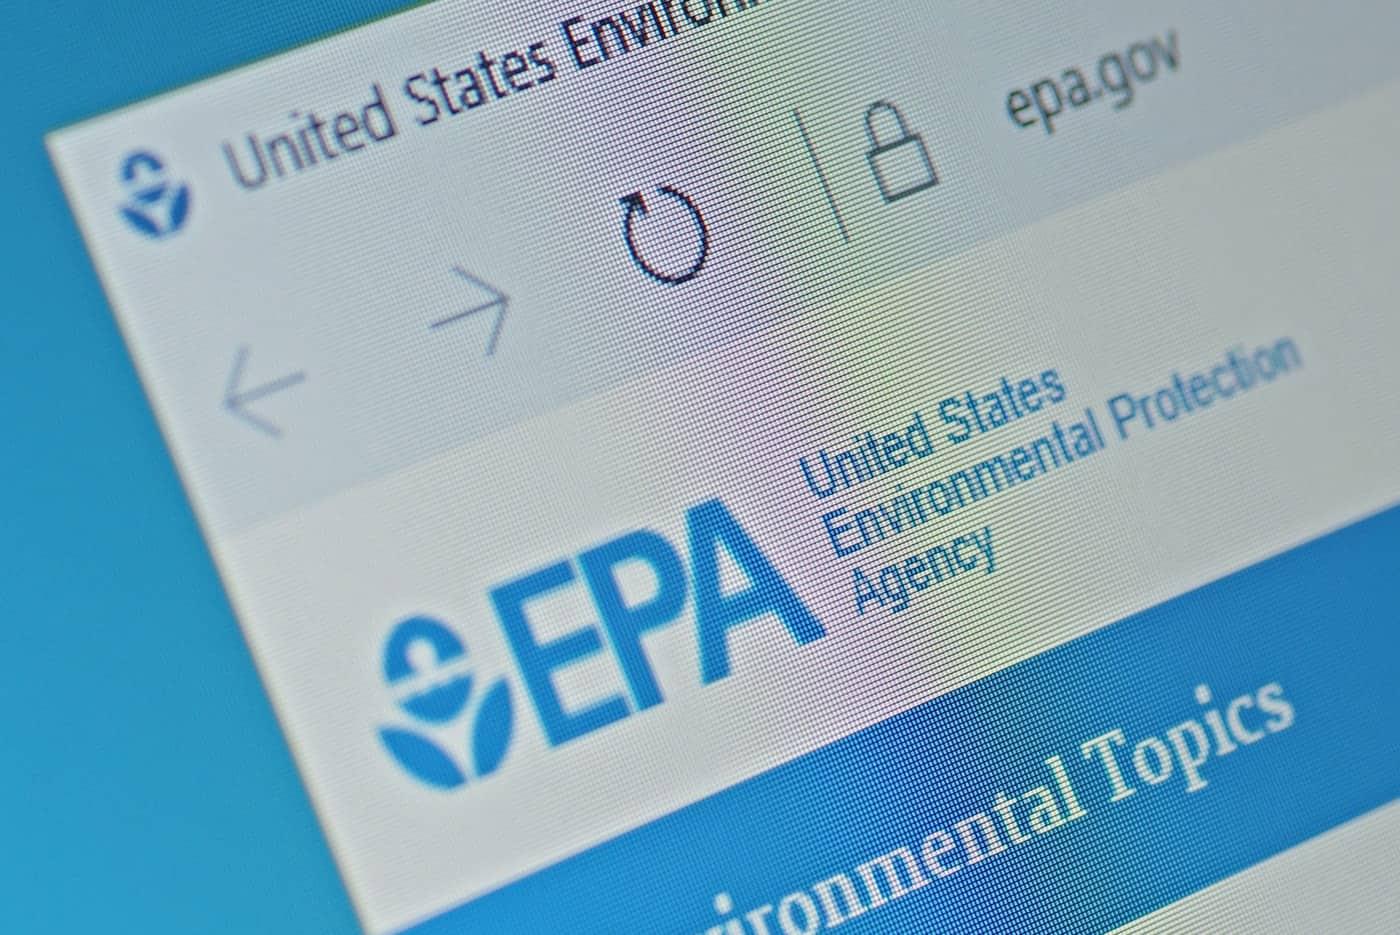 EPA's Asbestos Rule Impact